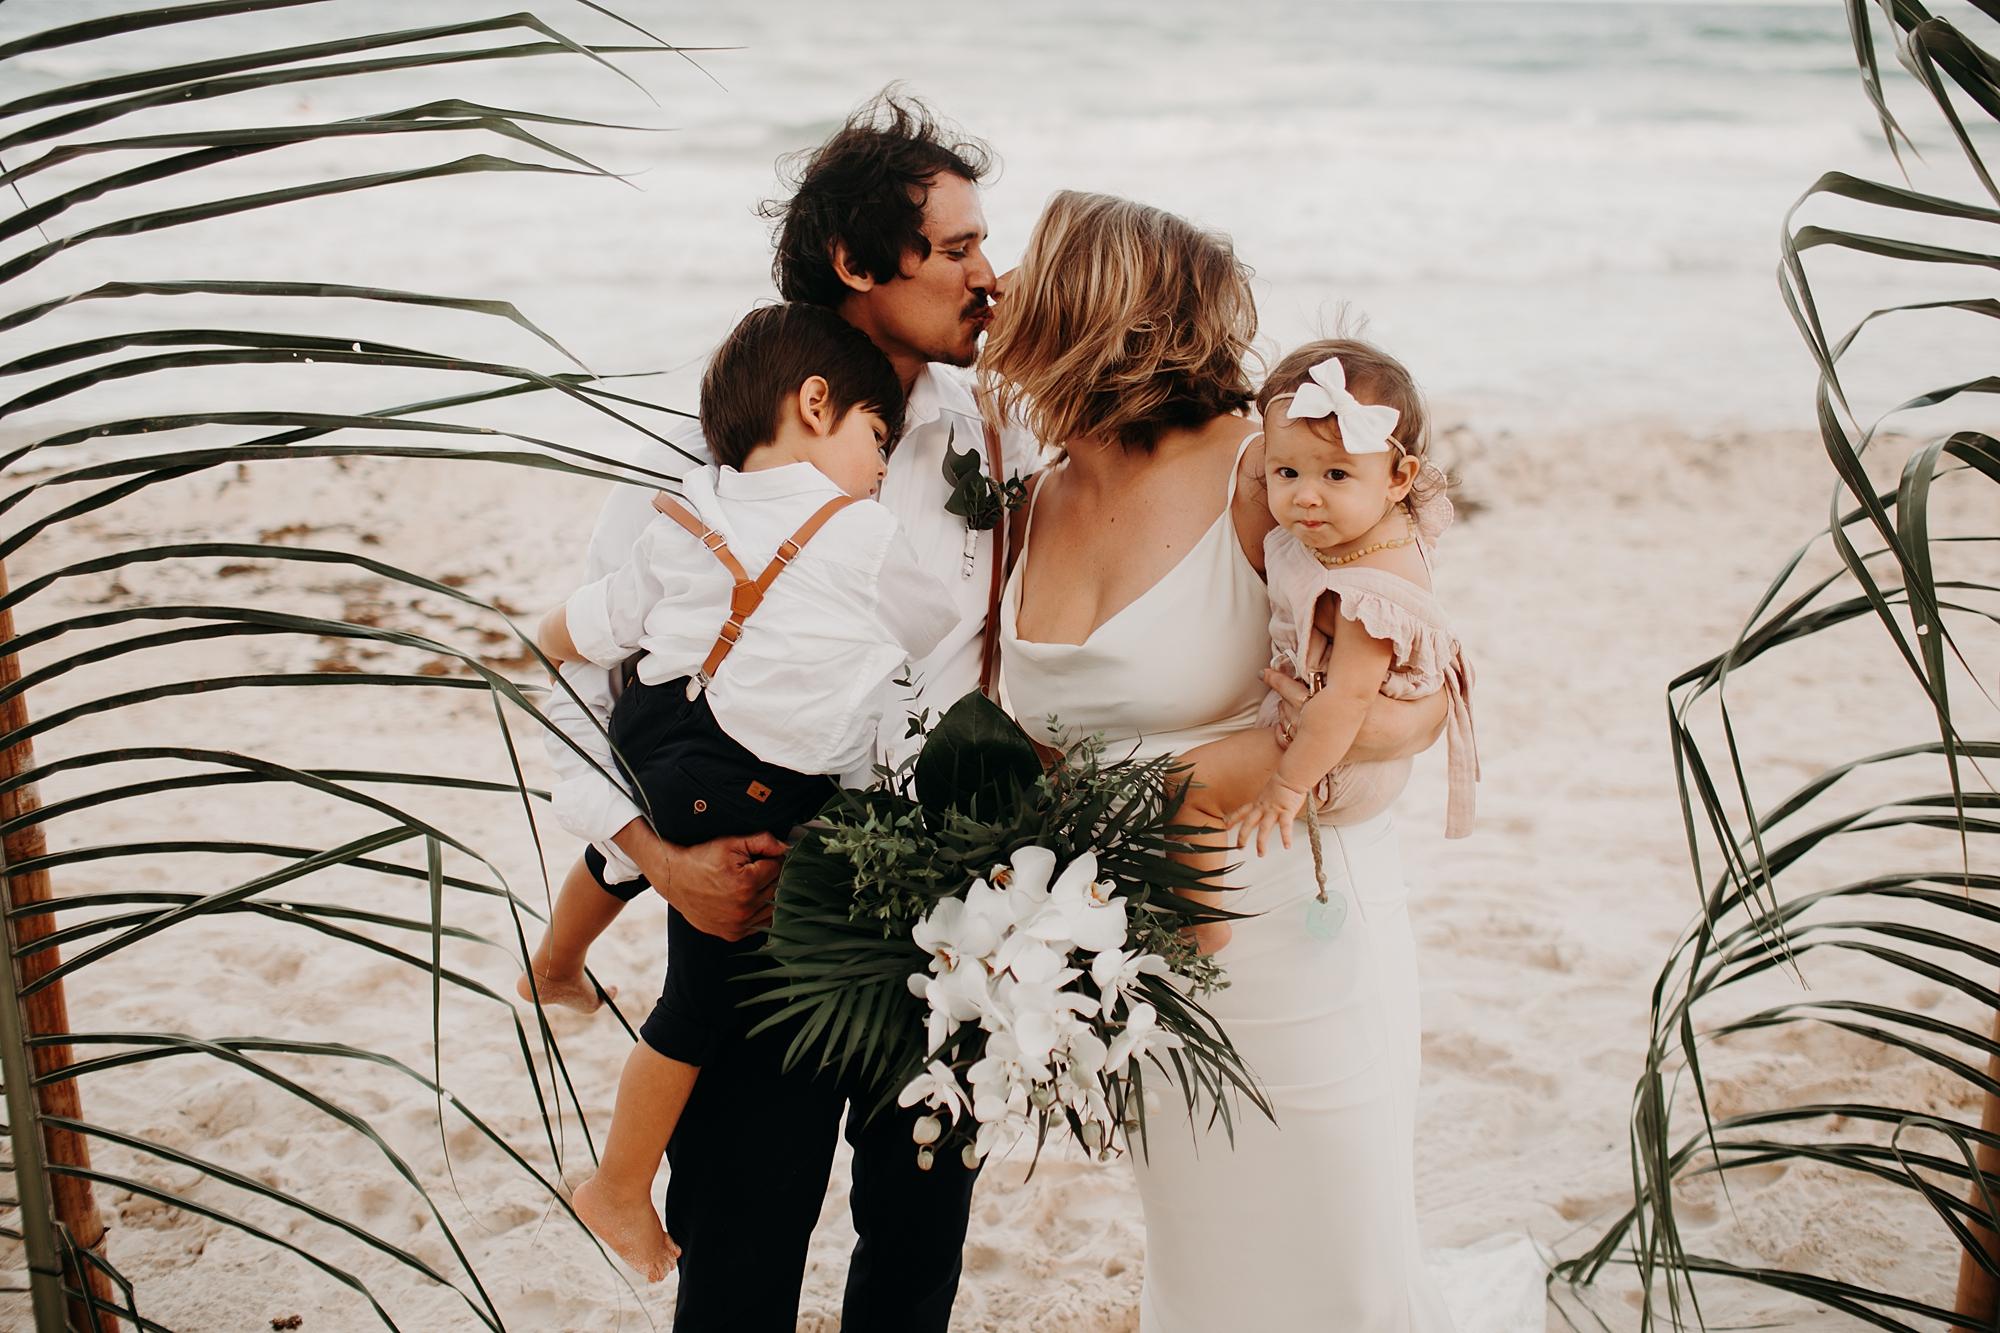 Danielle-San-Antonio-Wedding-Photographer-201_WEB.jpg